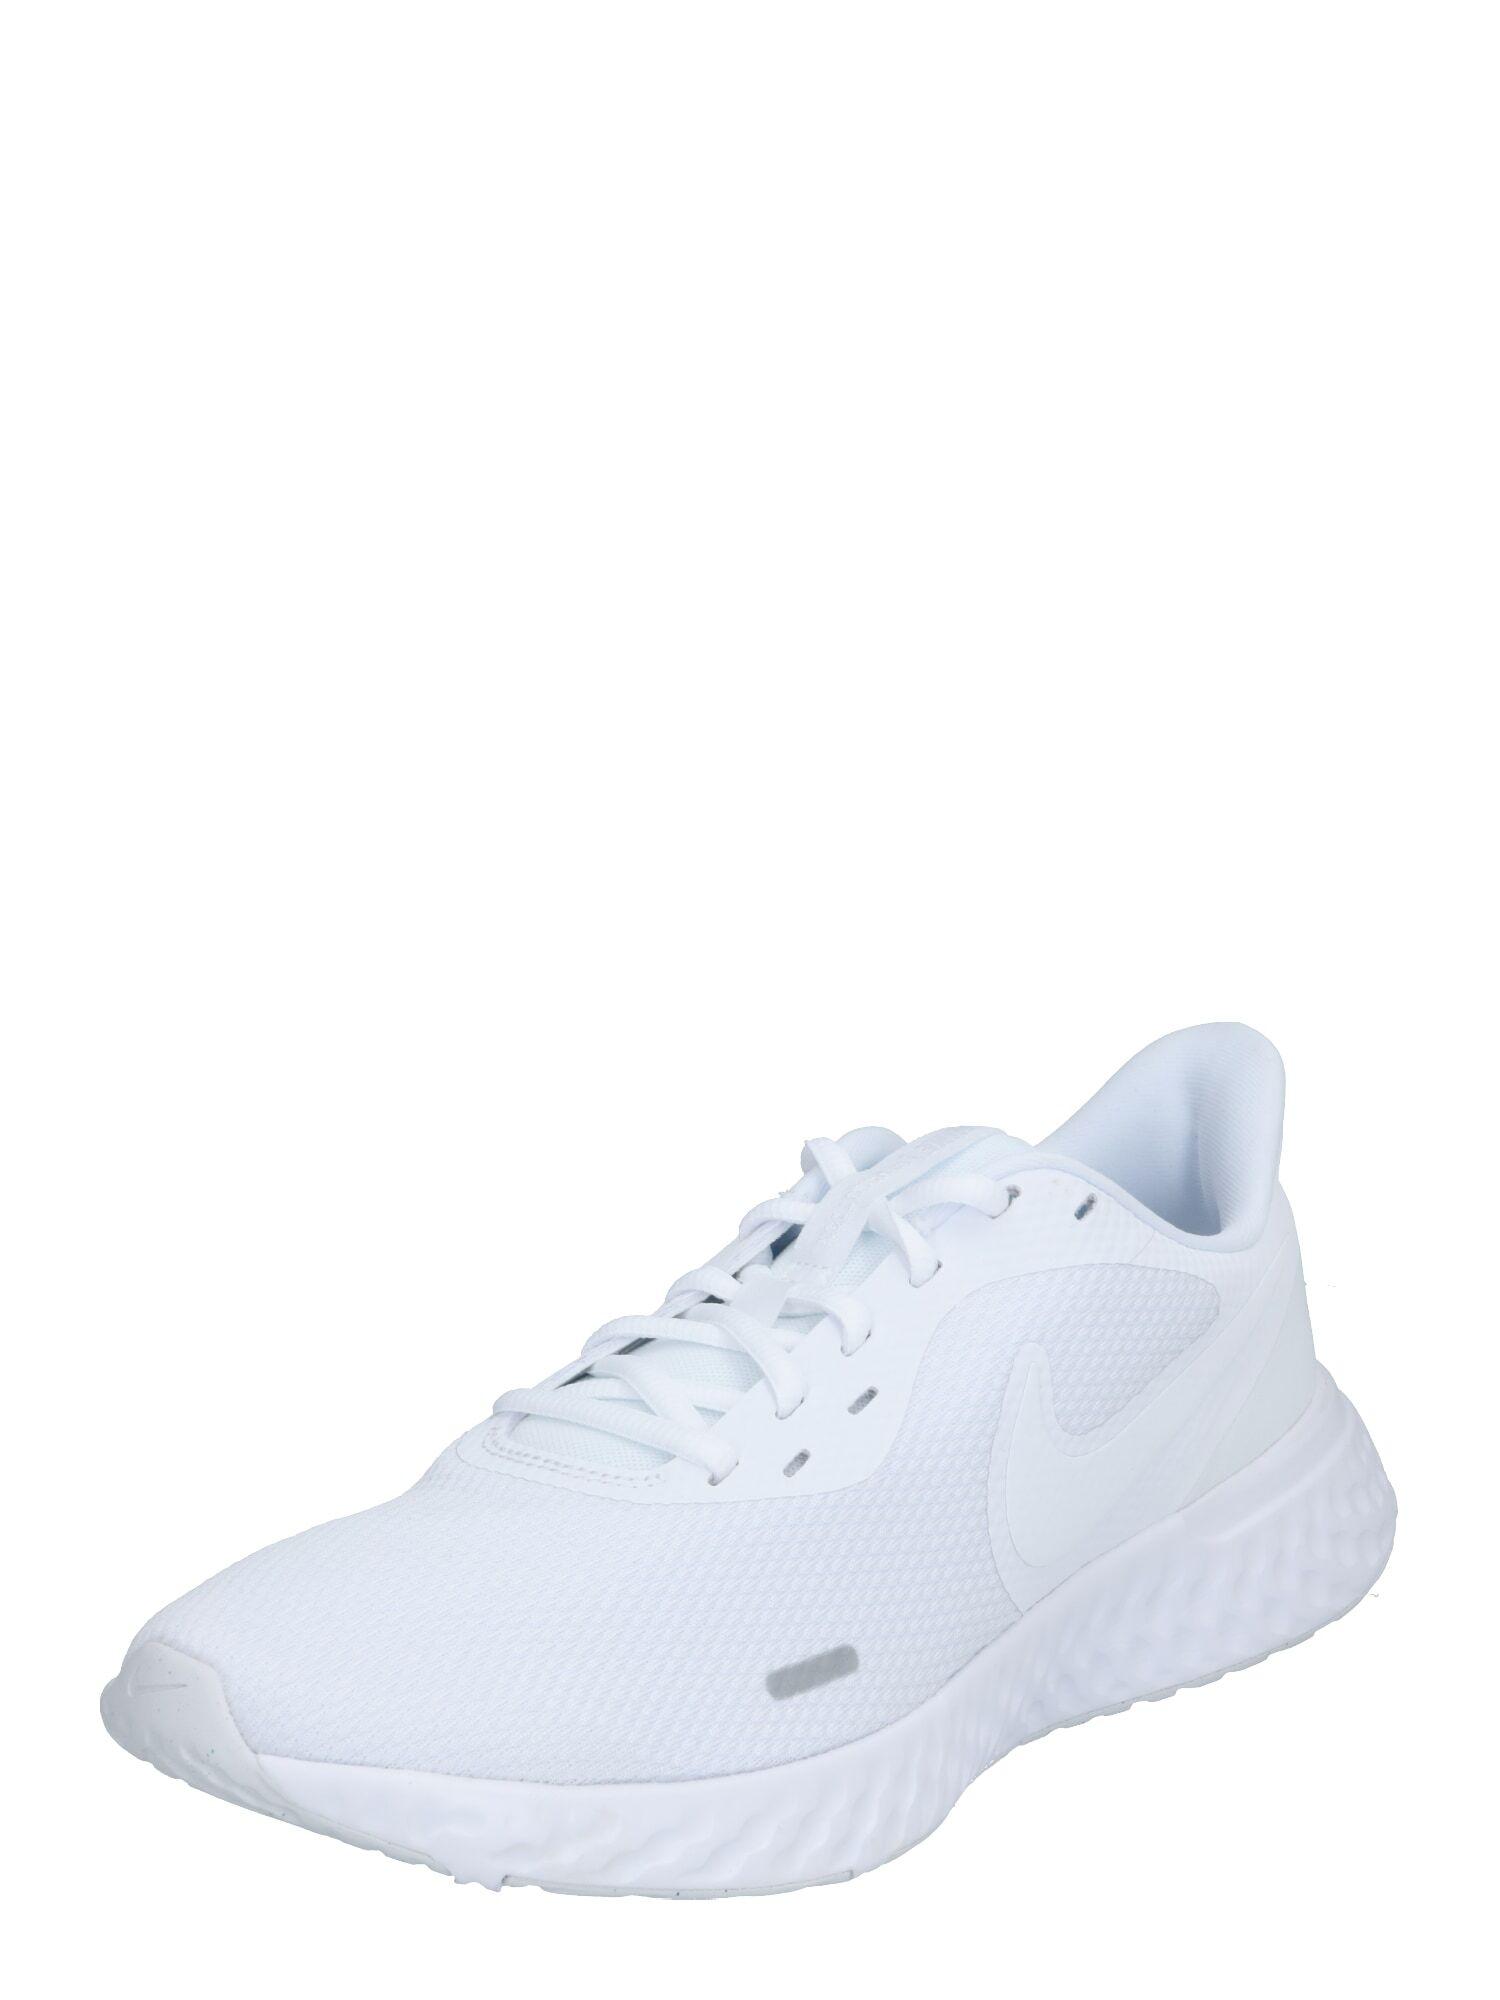 NIKE Chaussure de course 'Revolution 5'  - Blanc - Taille: 12 - male